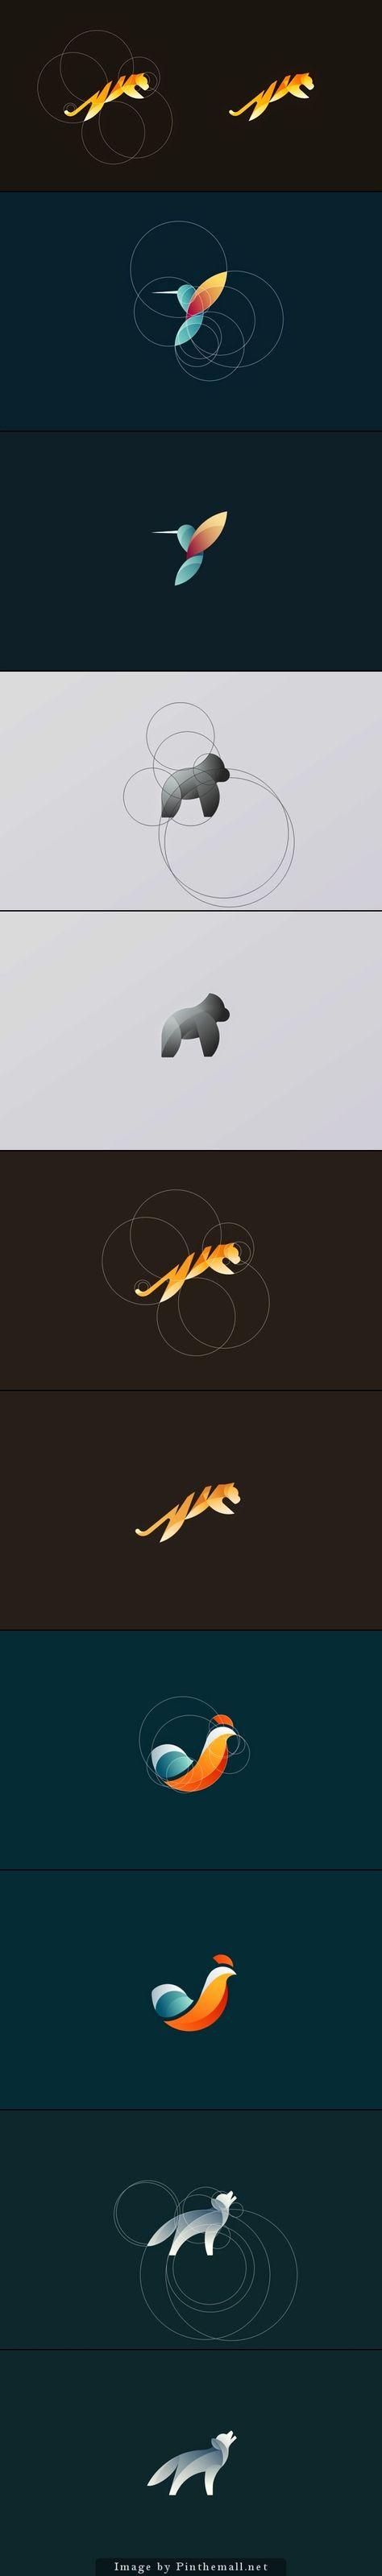 Animal Logos Vol 1